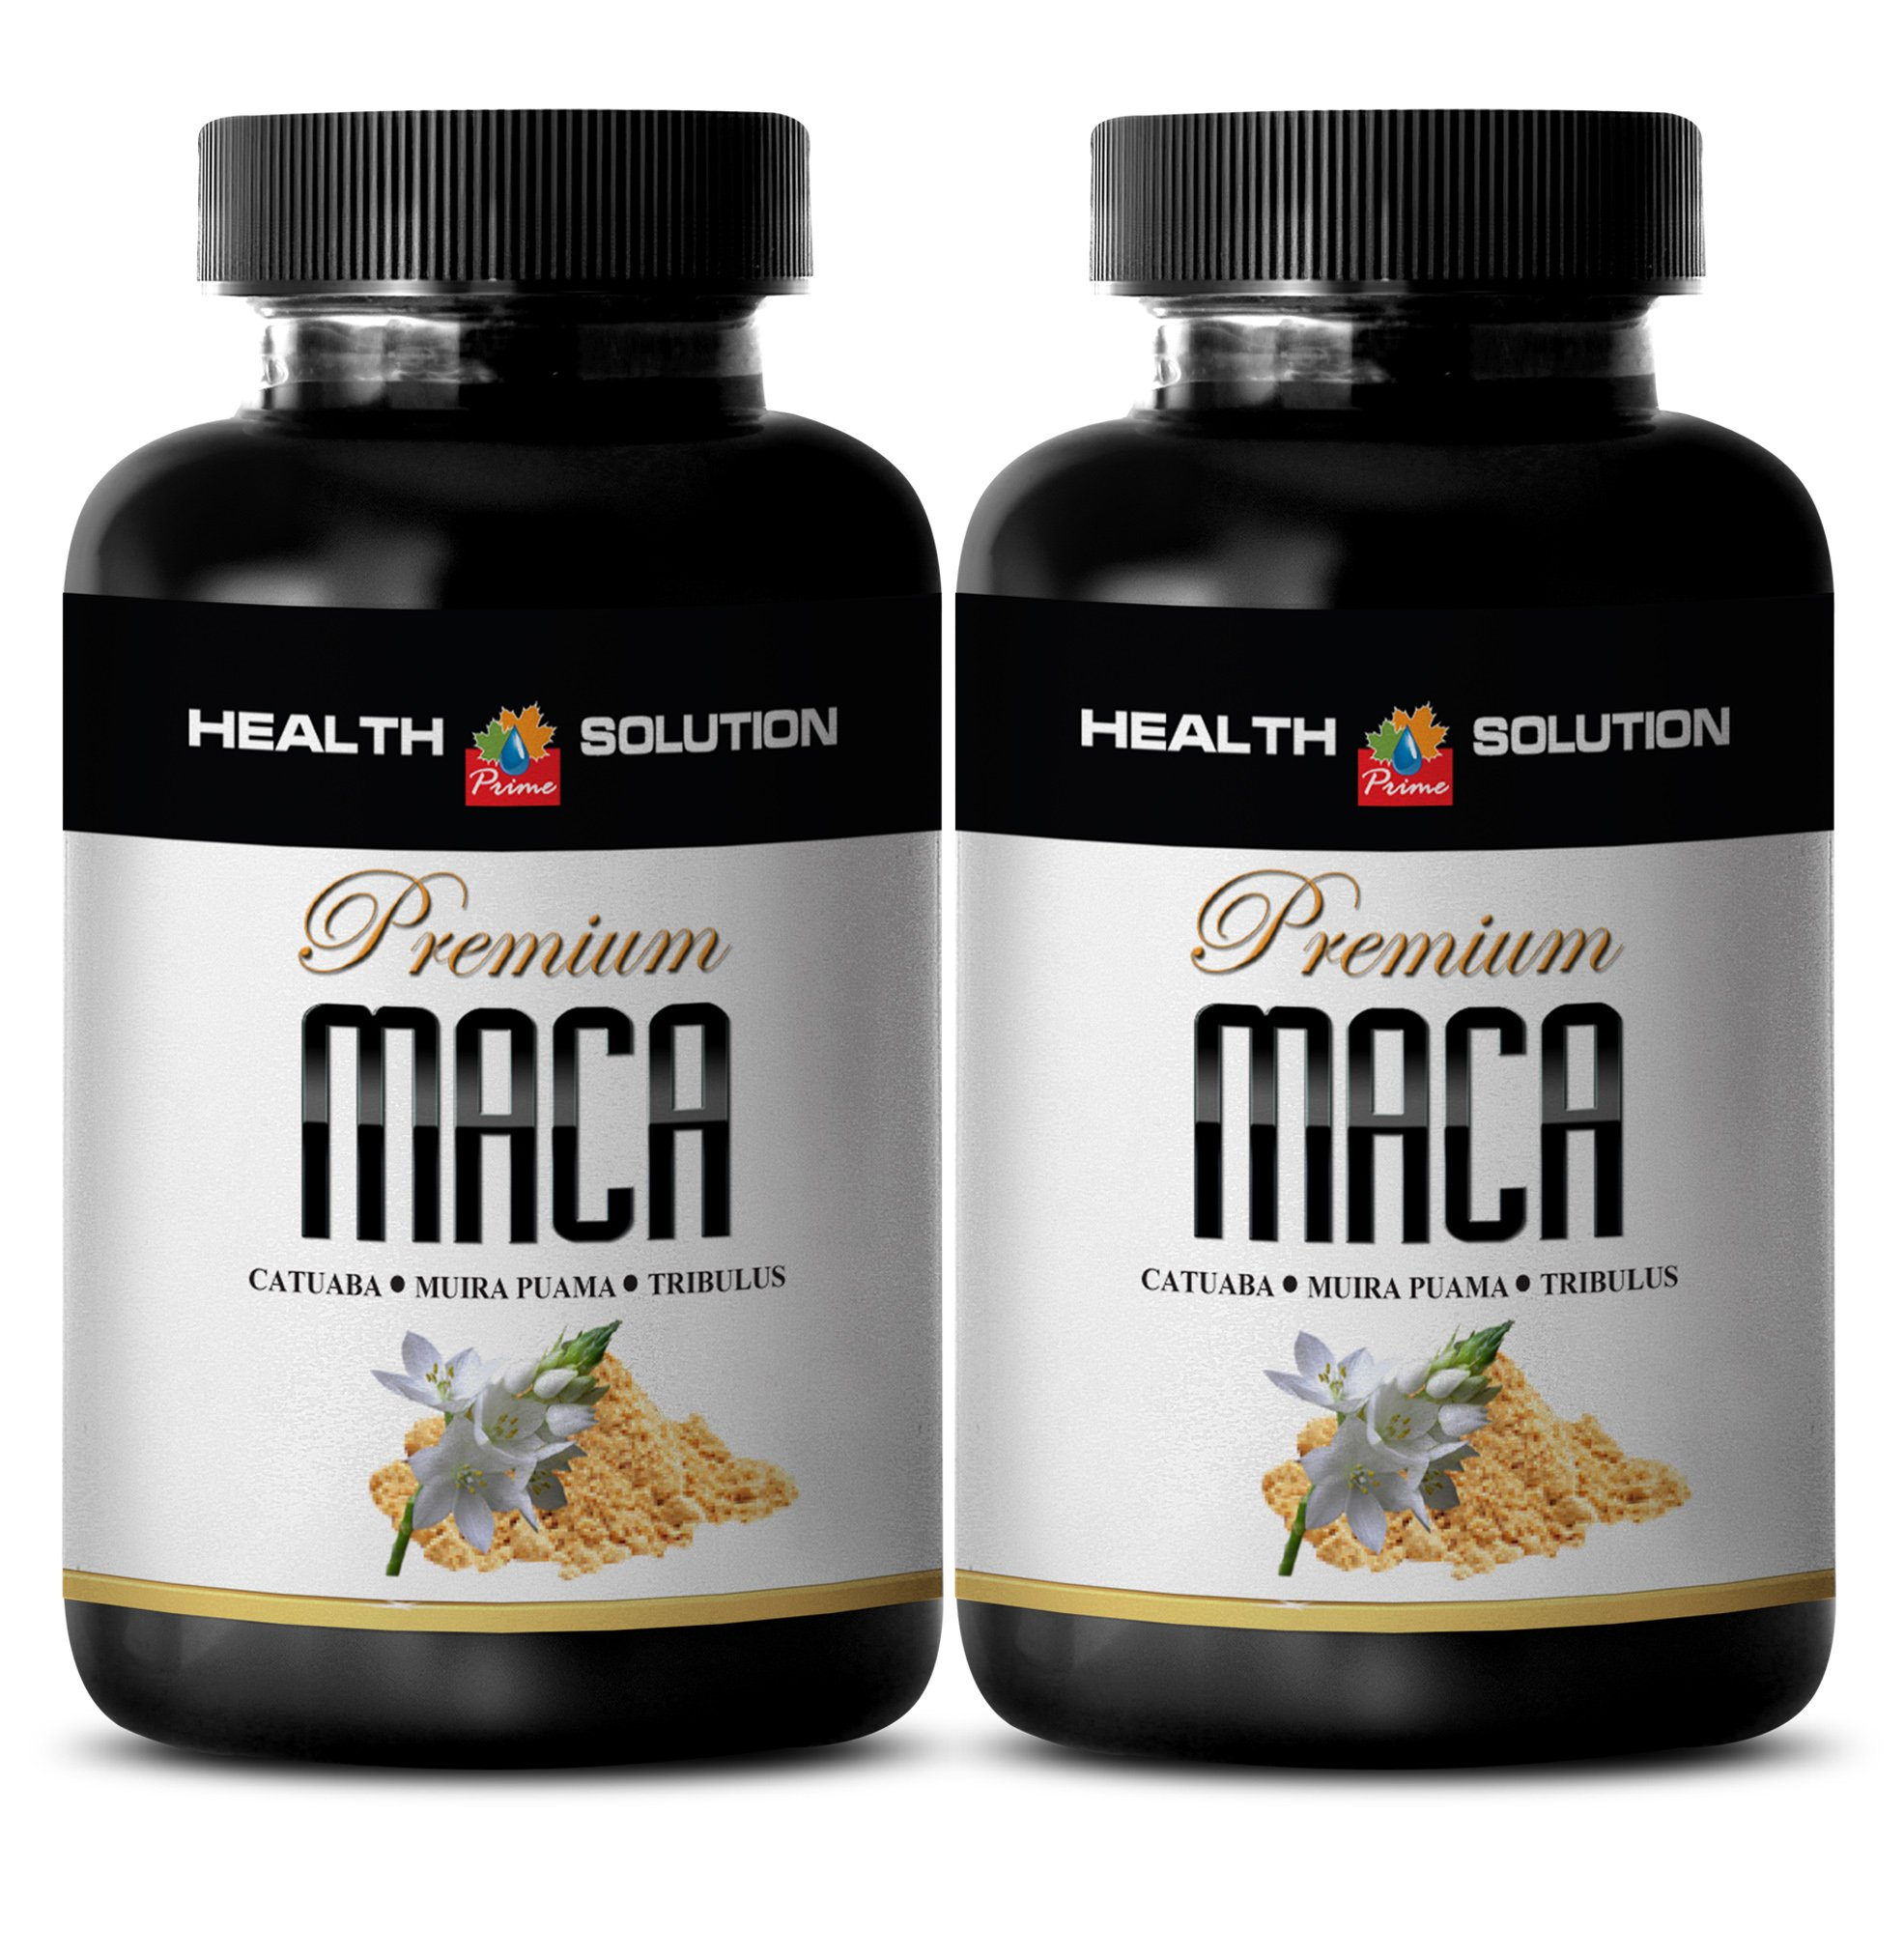 increase female libido - MACA PLUS 1300MG - maca extract capsules - 2 Bottles (120 Tablets)